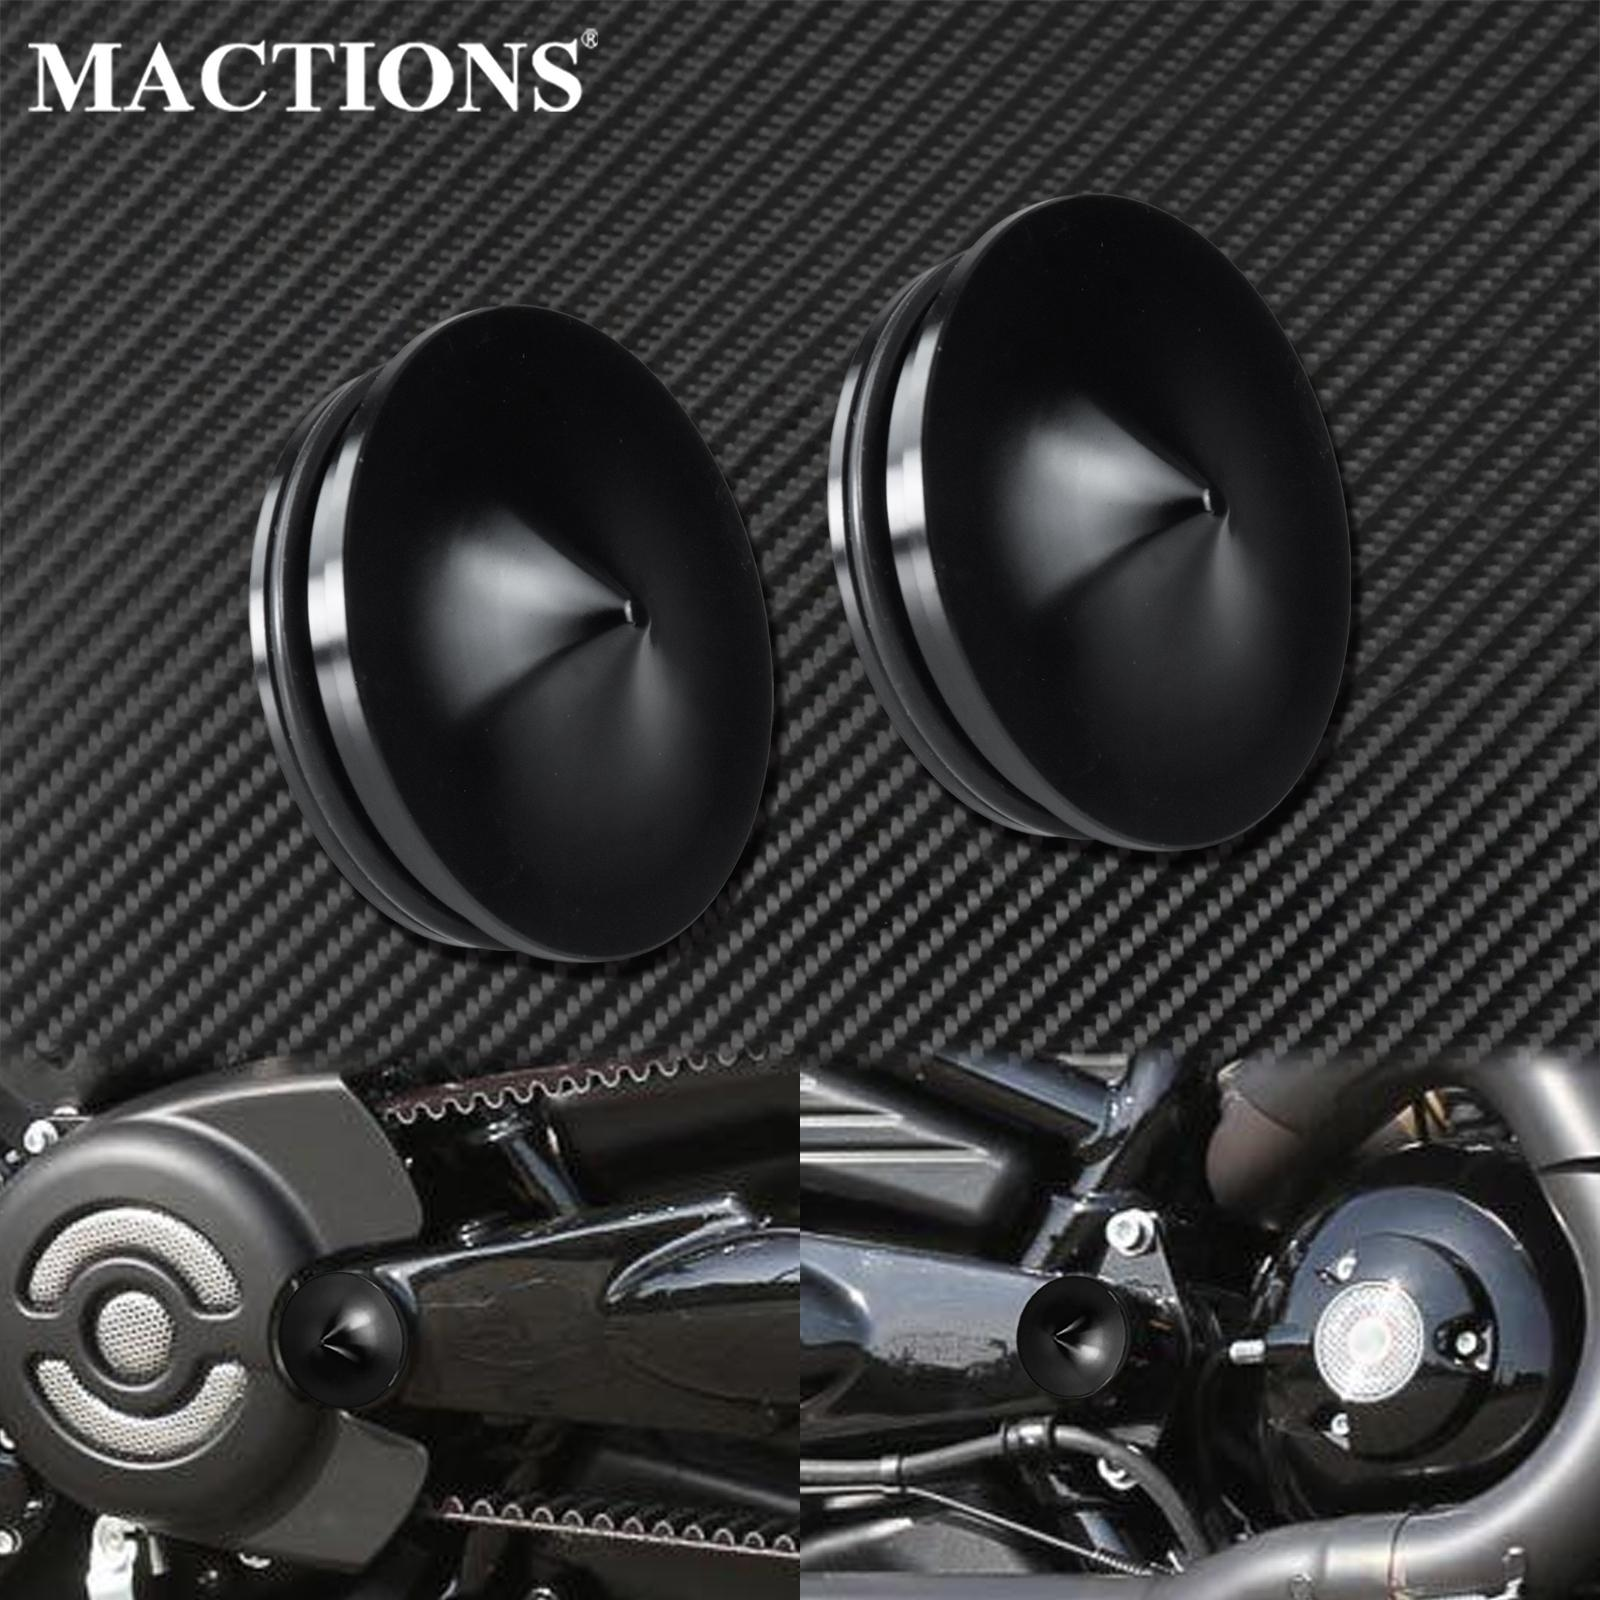 2xмотоциклетная маятниковая Накладка для болтов, алюминиевая черная для Harley V-Rod 2006-2017, ночная штанга, специальная мышечная VRSCF VRSCR VRSCD VRSCAW